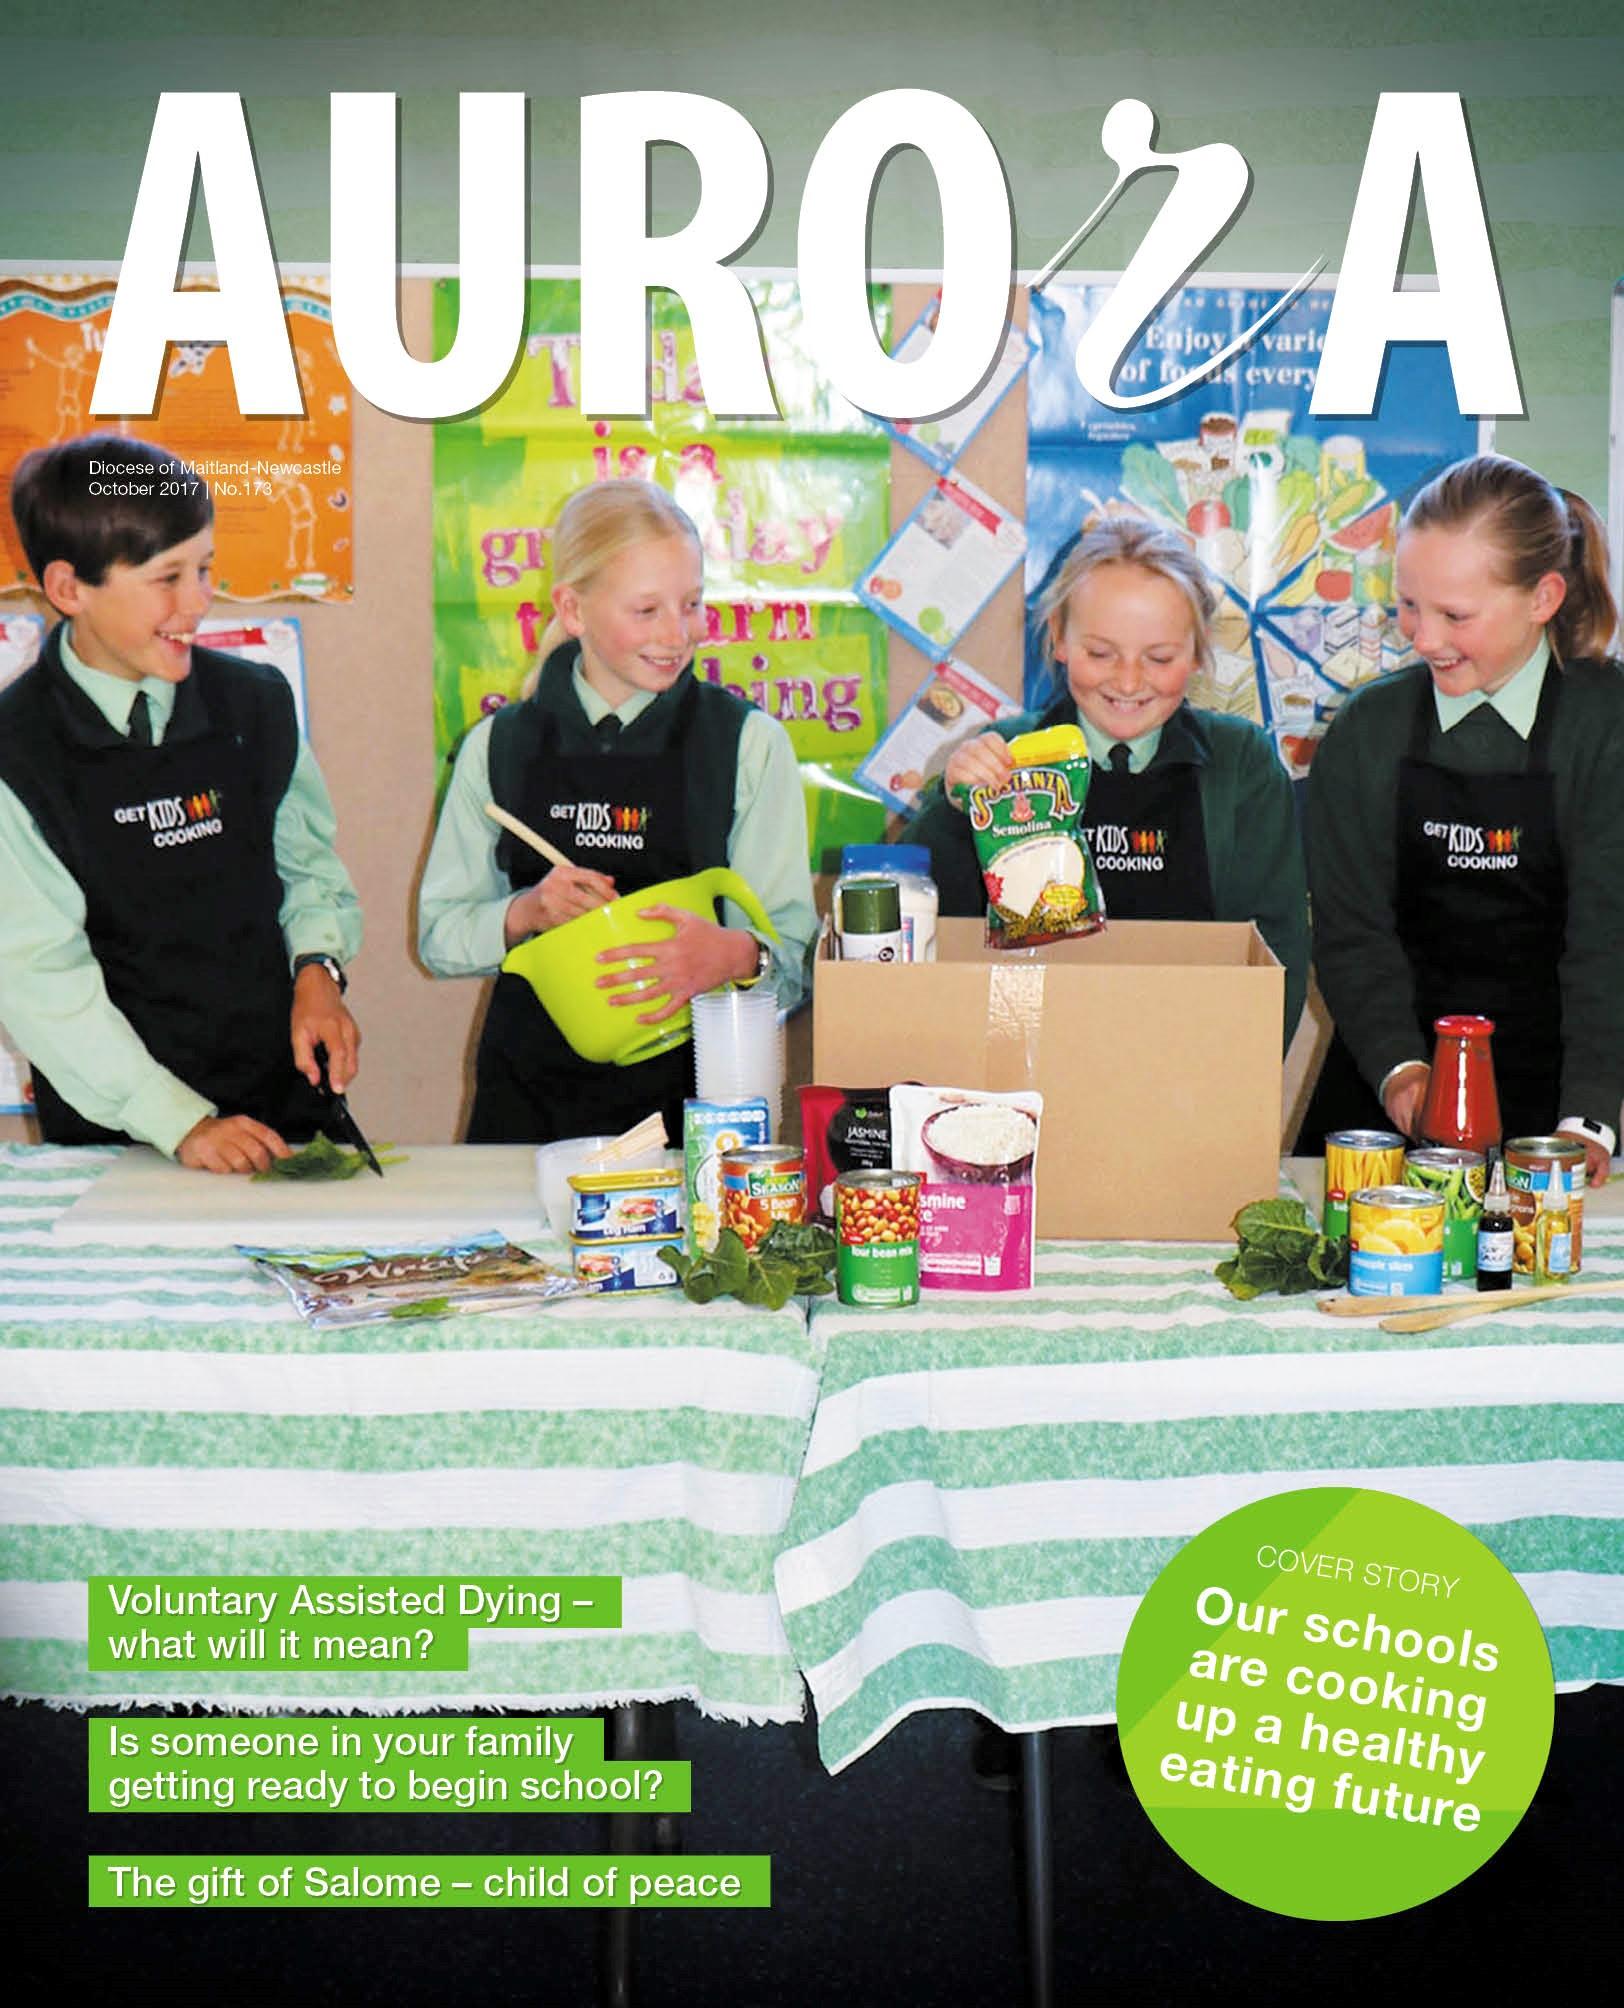 Aurora October 2017 Cover Image